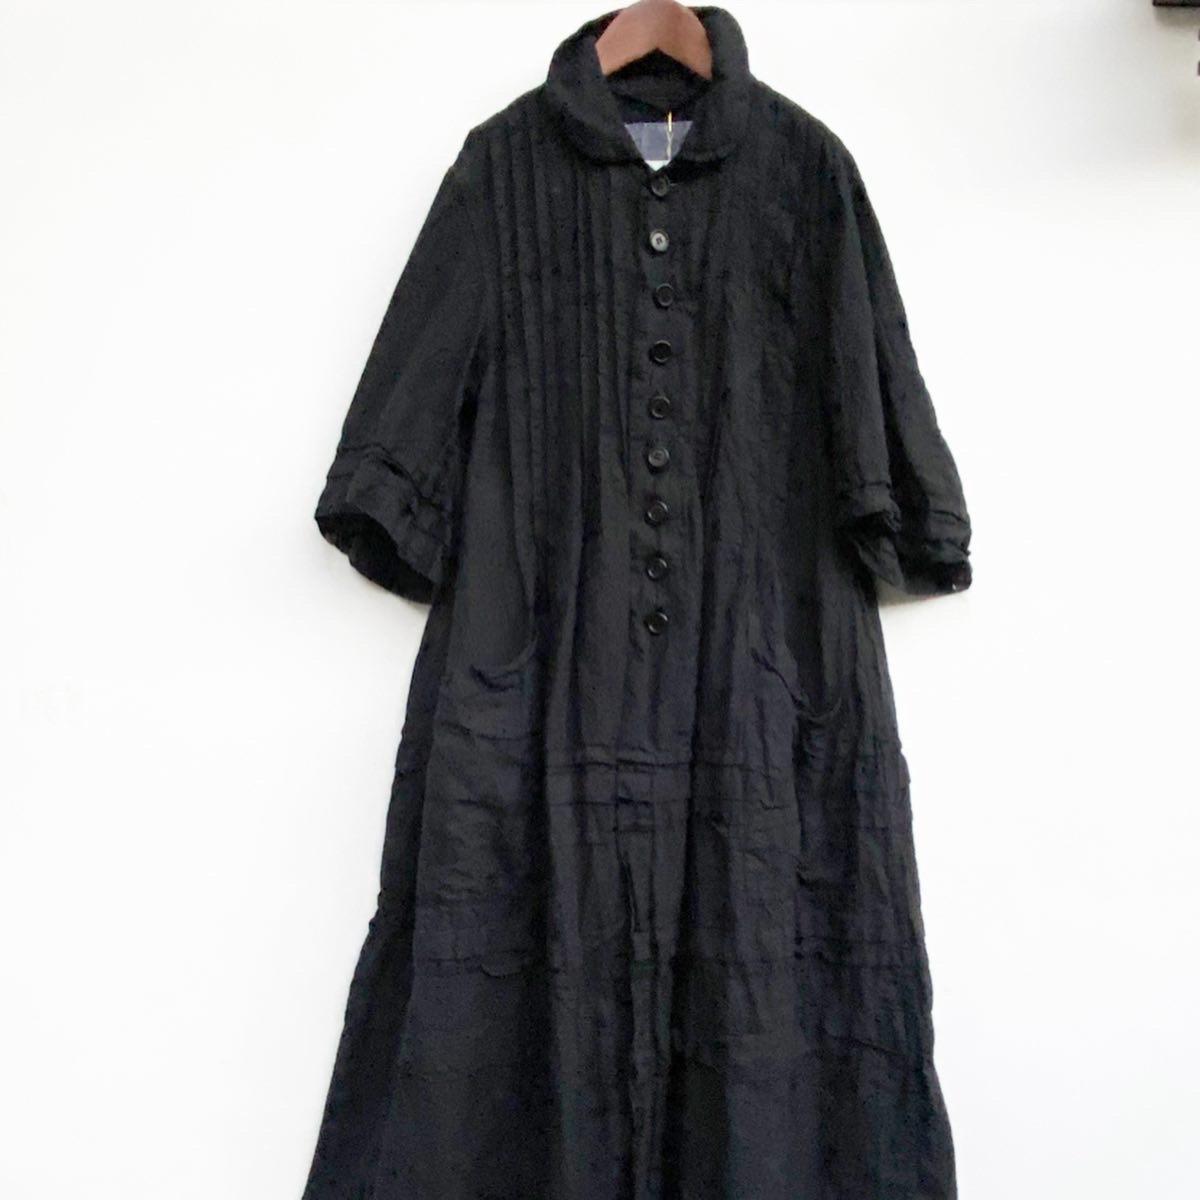 hallelujha /ヴィクトリア時代のコート